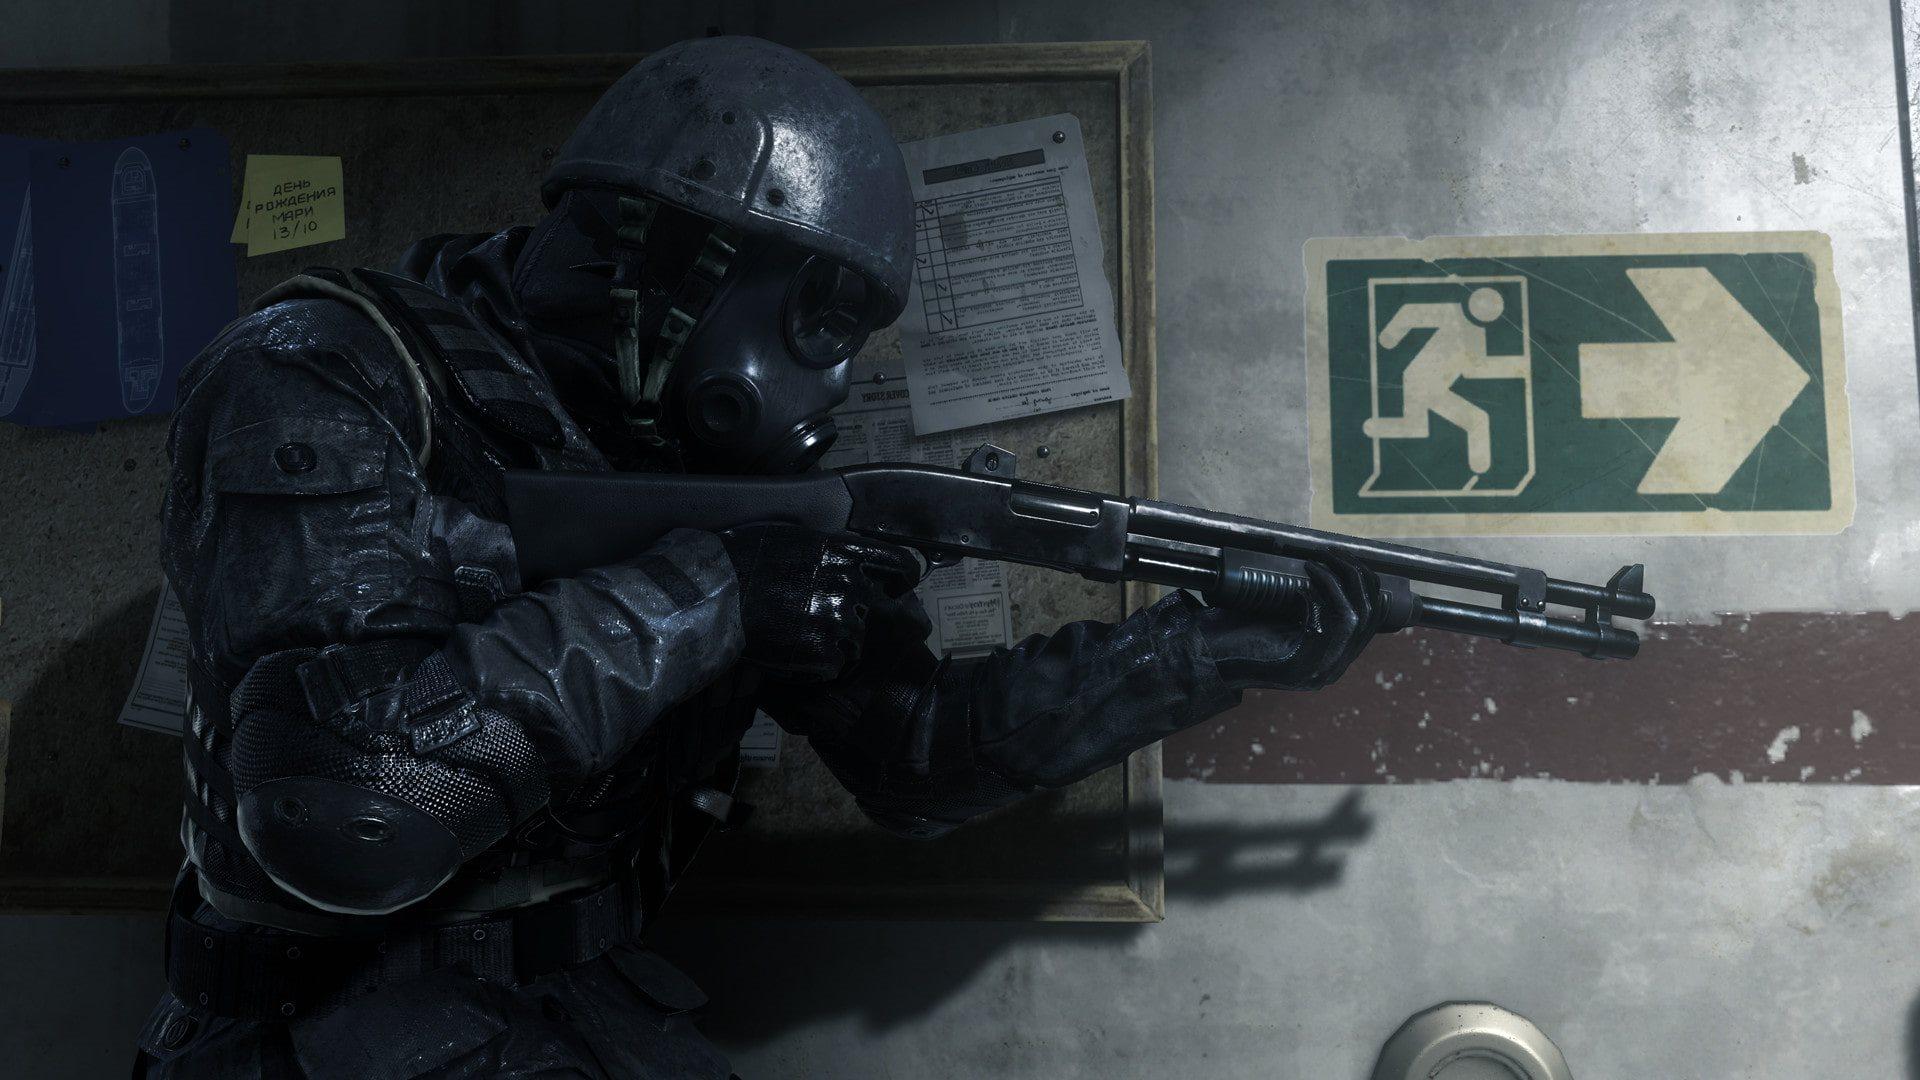 Call of Duty: Modern Warfare Remastered; screenshot: soldier